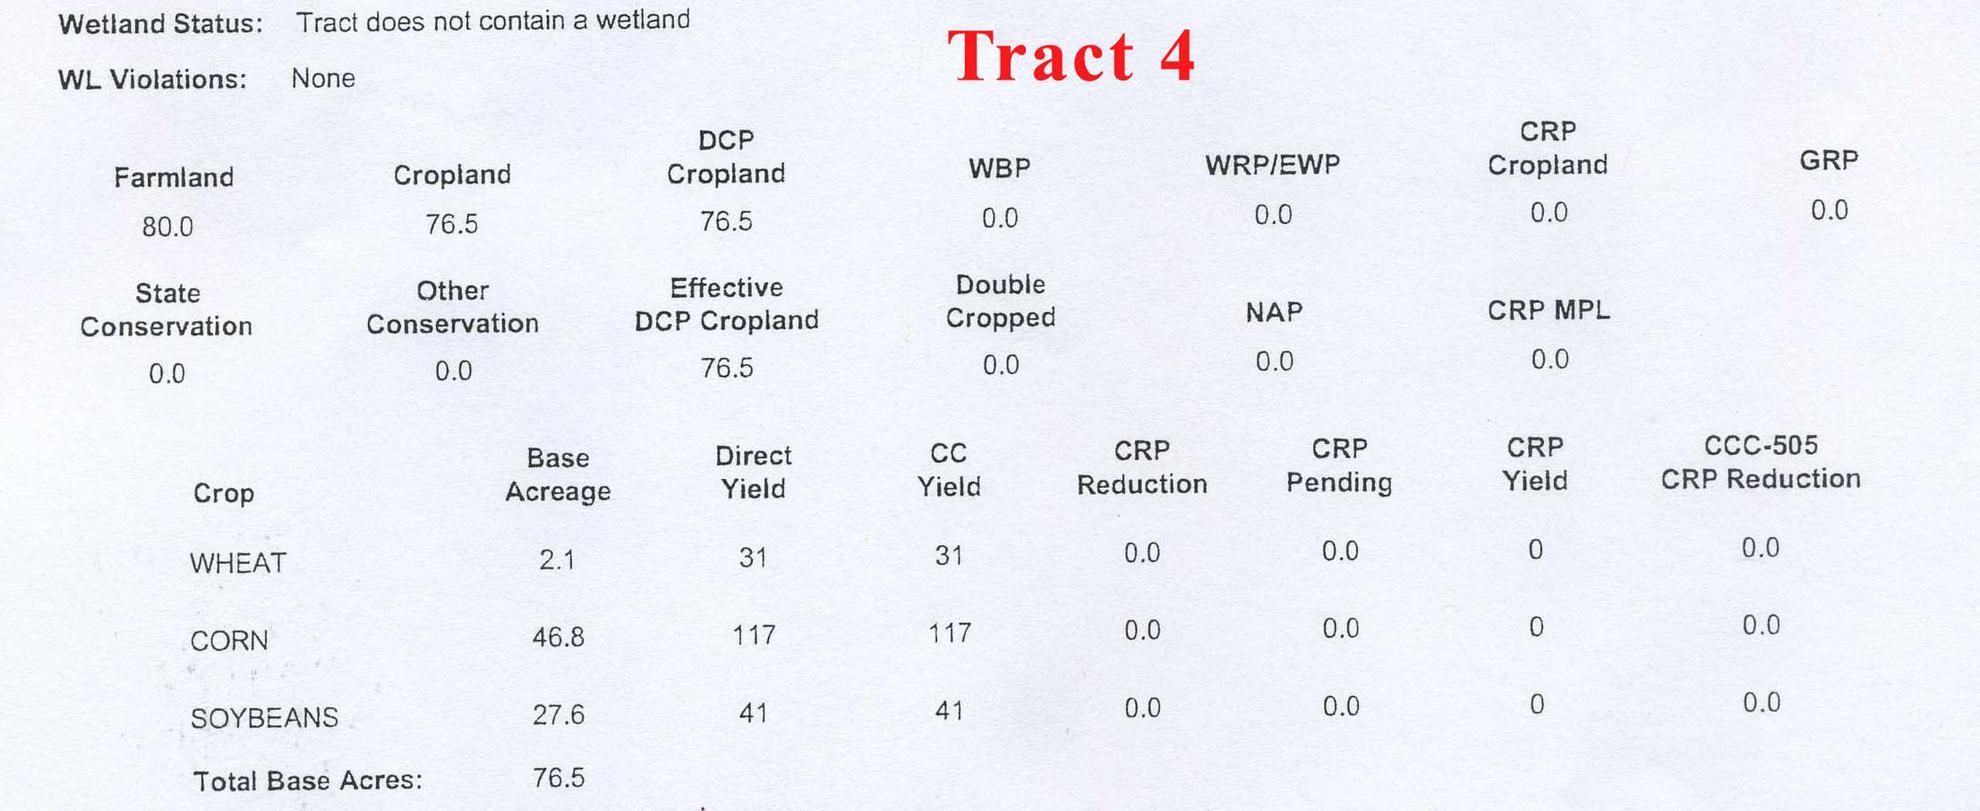 Crop-Tract-4.jpg